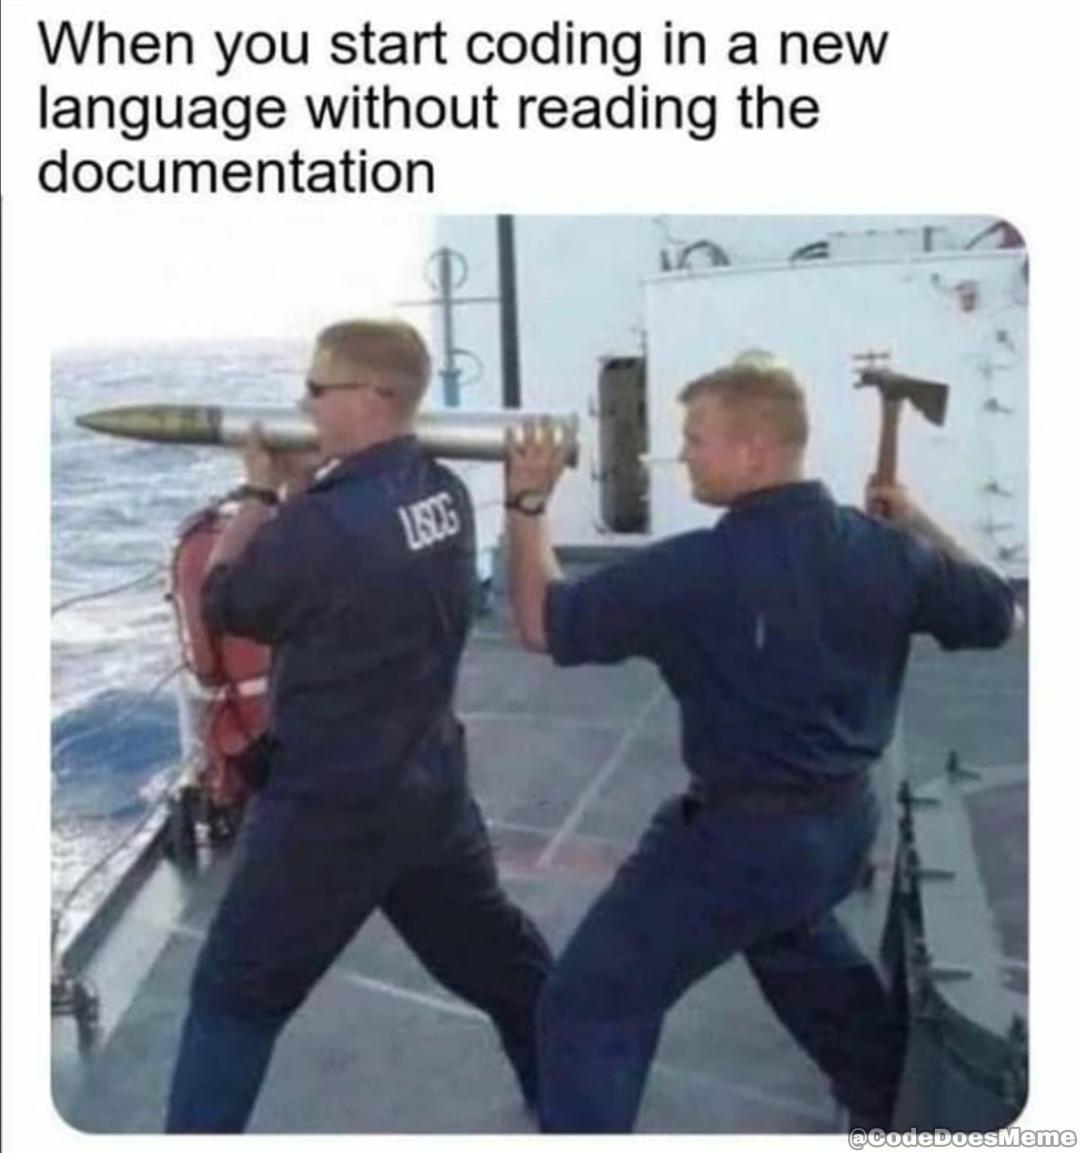 nuevo lenguaje